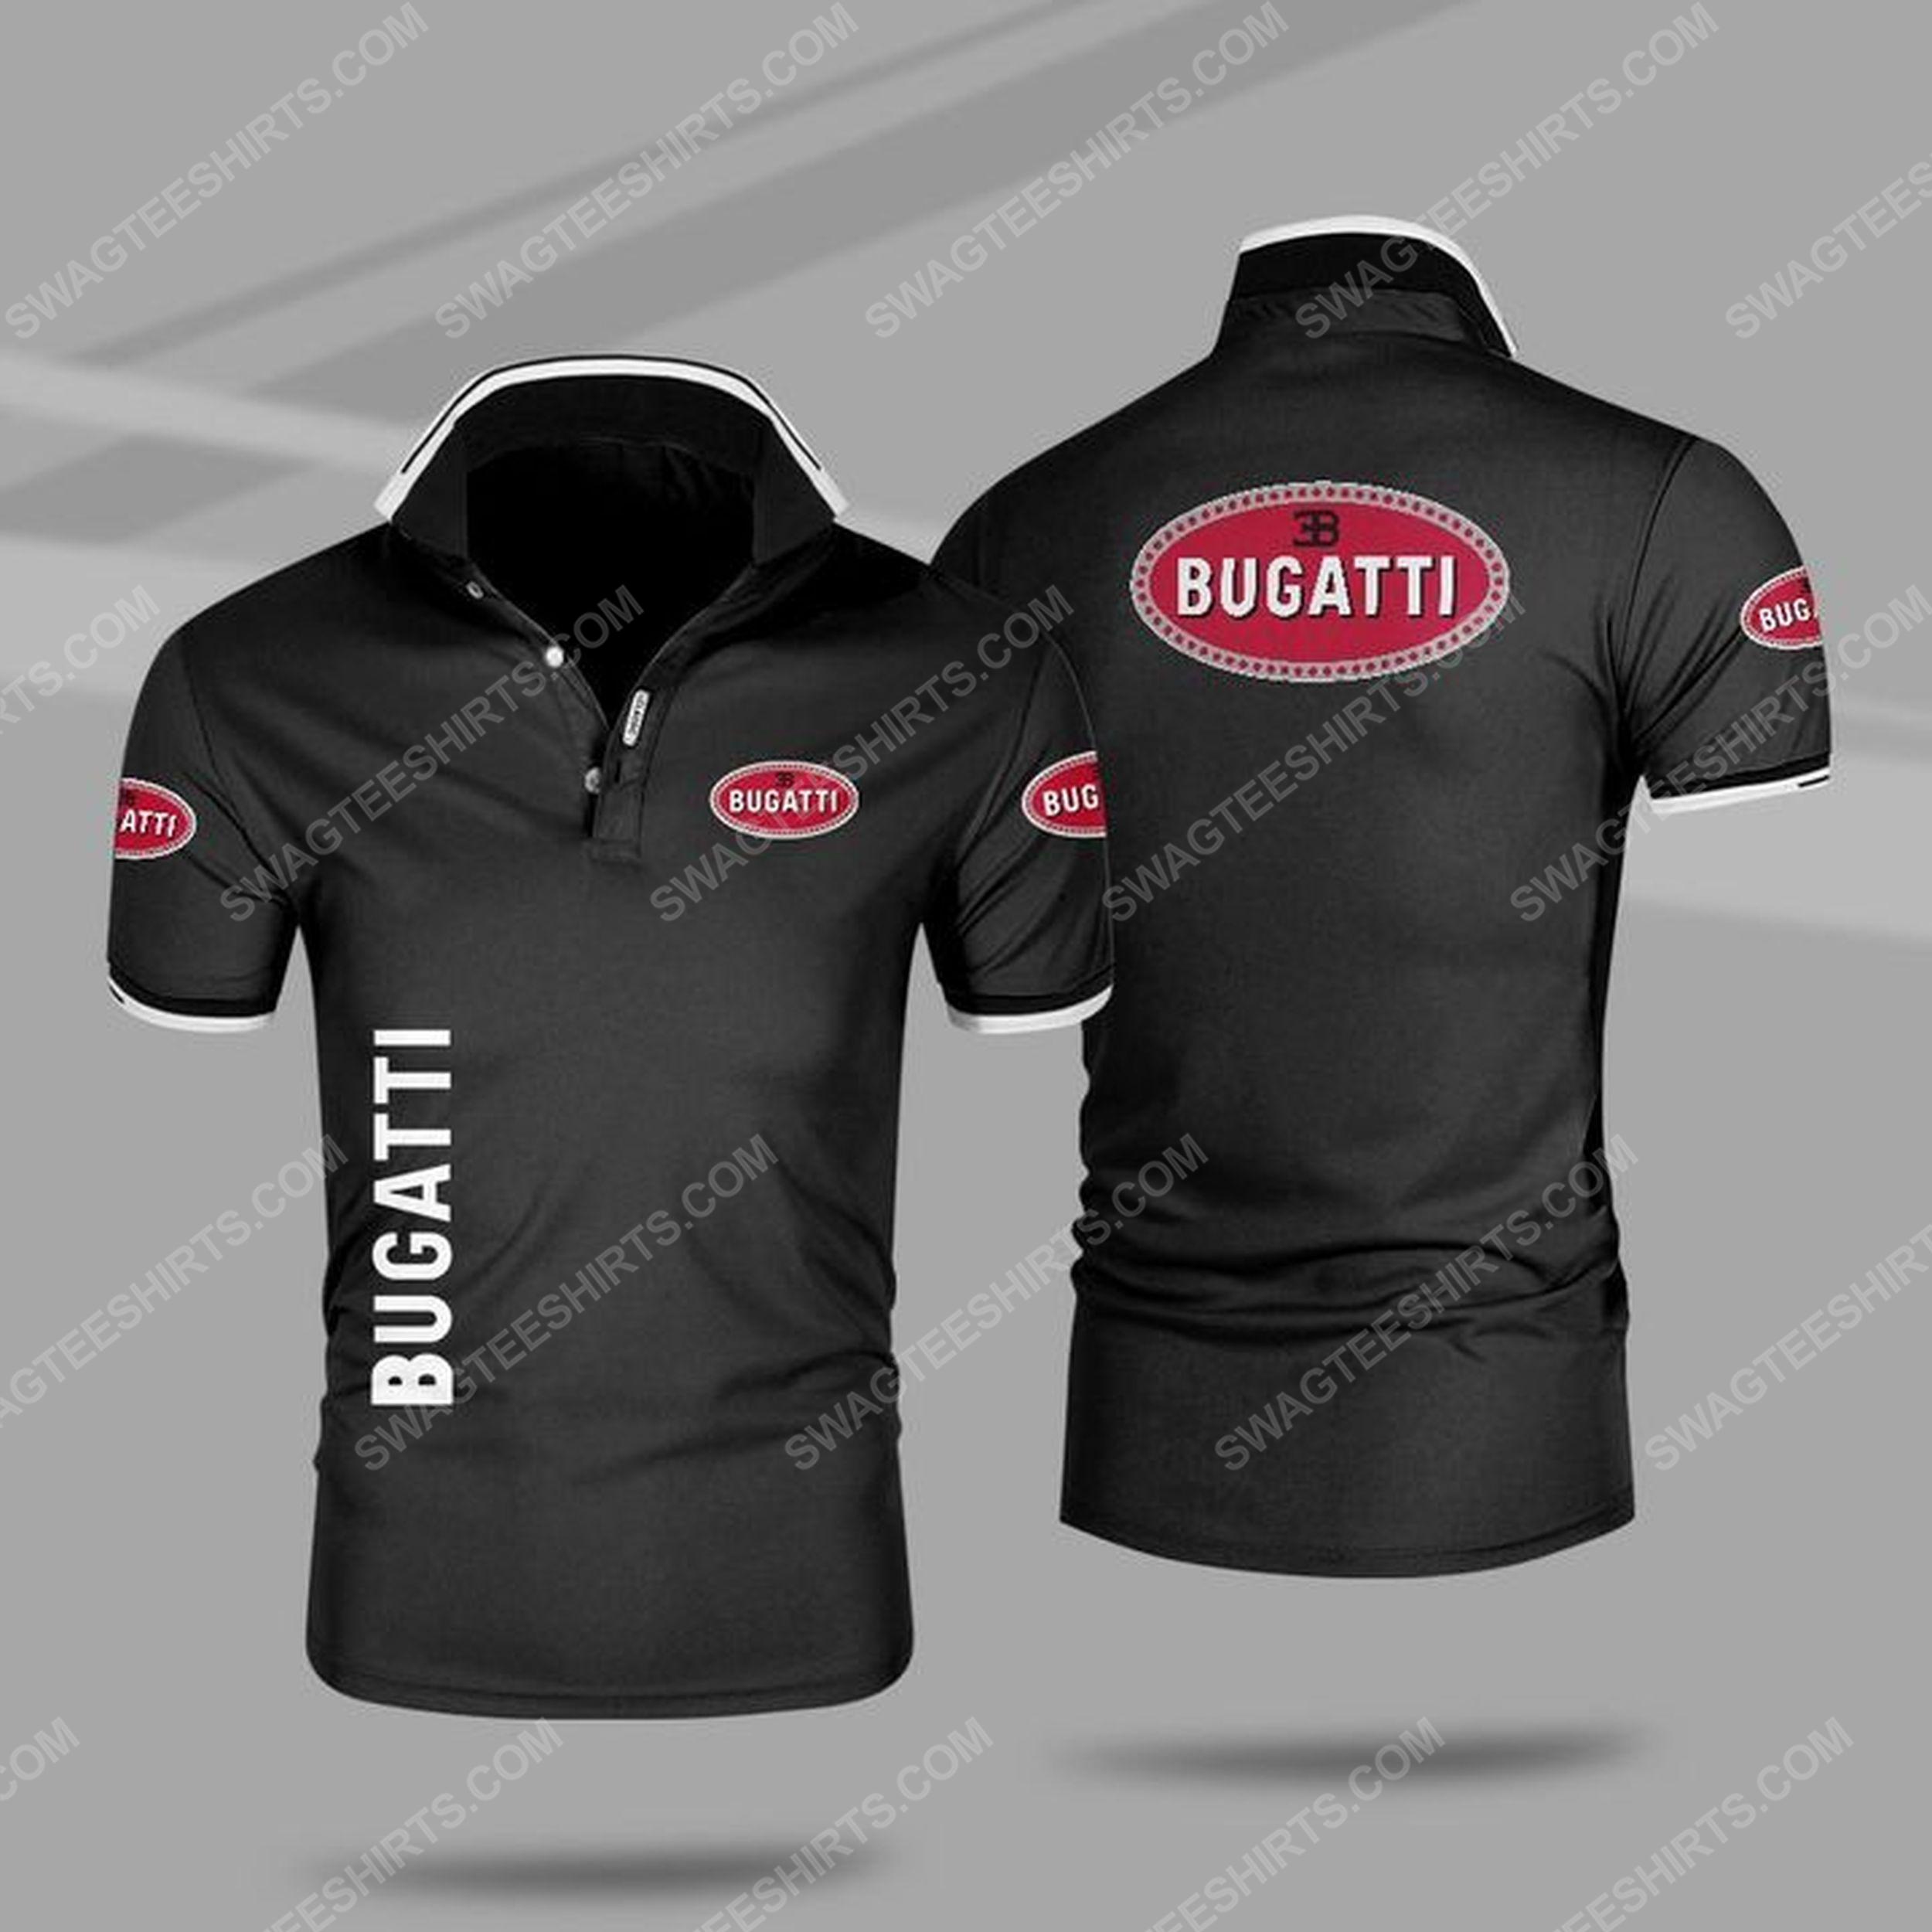 The bugatti sports car all over print polo shirt - black 1